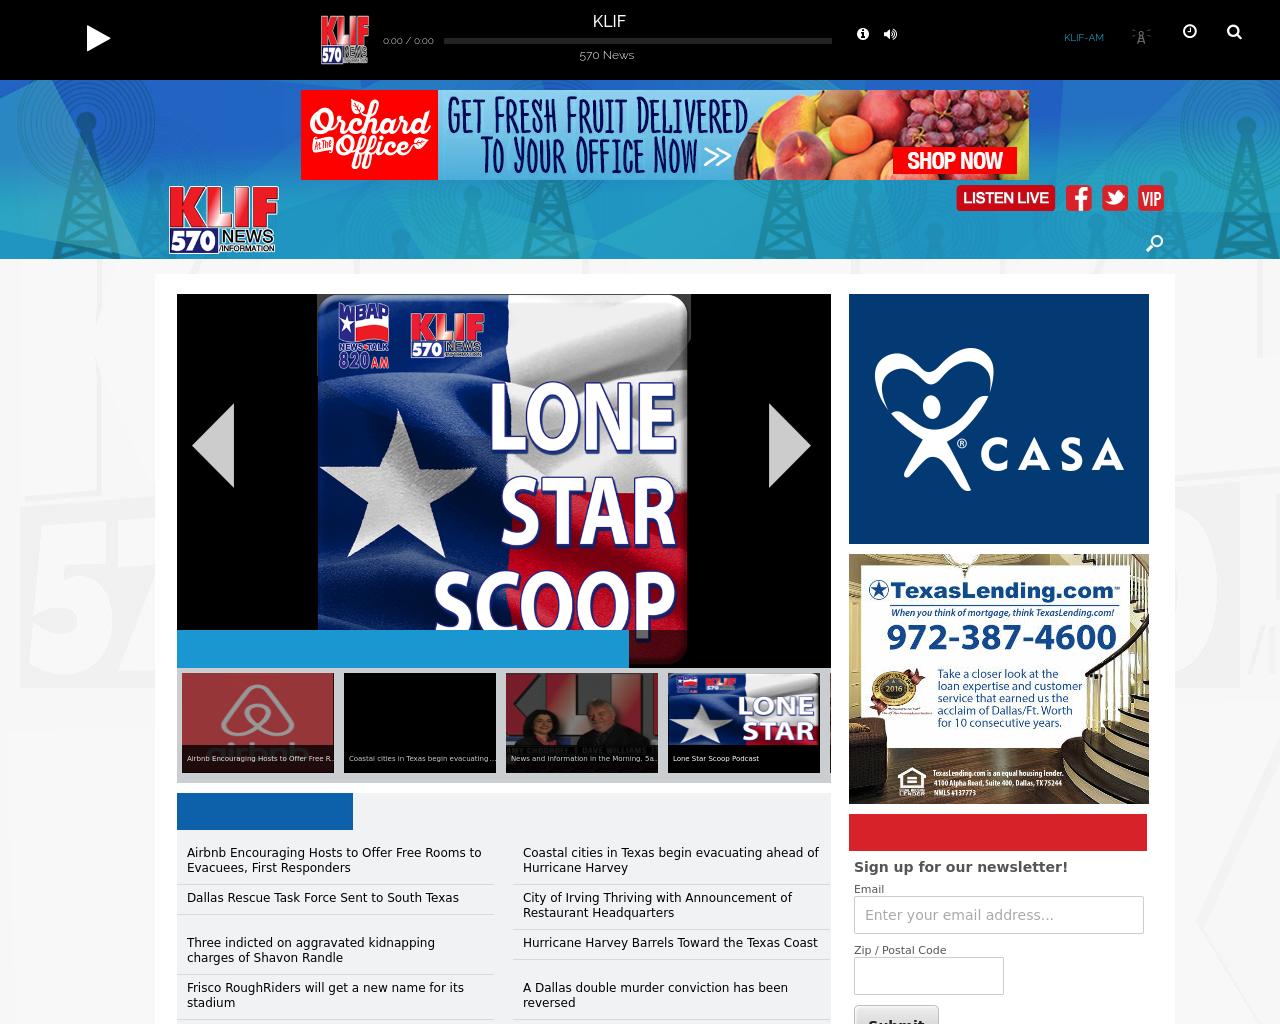 Klif-News-and-Information-Advertising-Reviews-Pricing